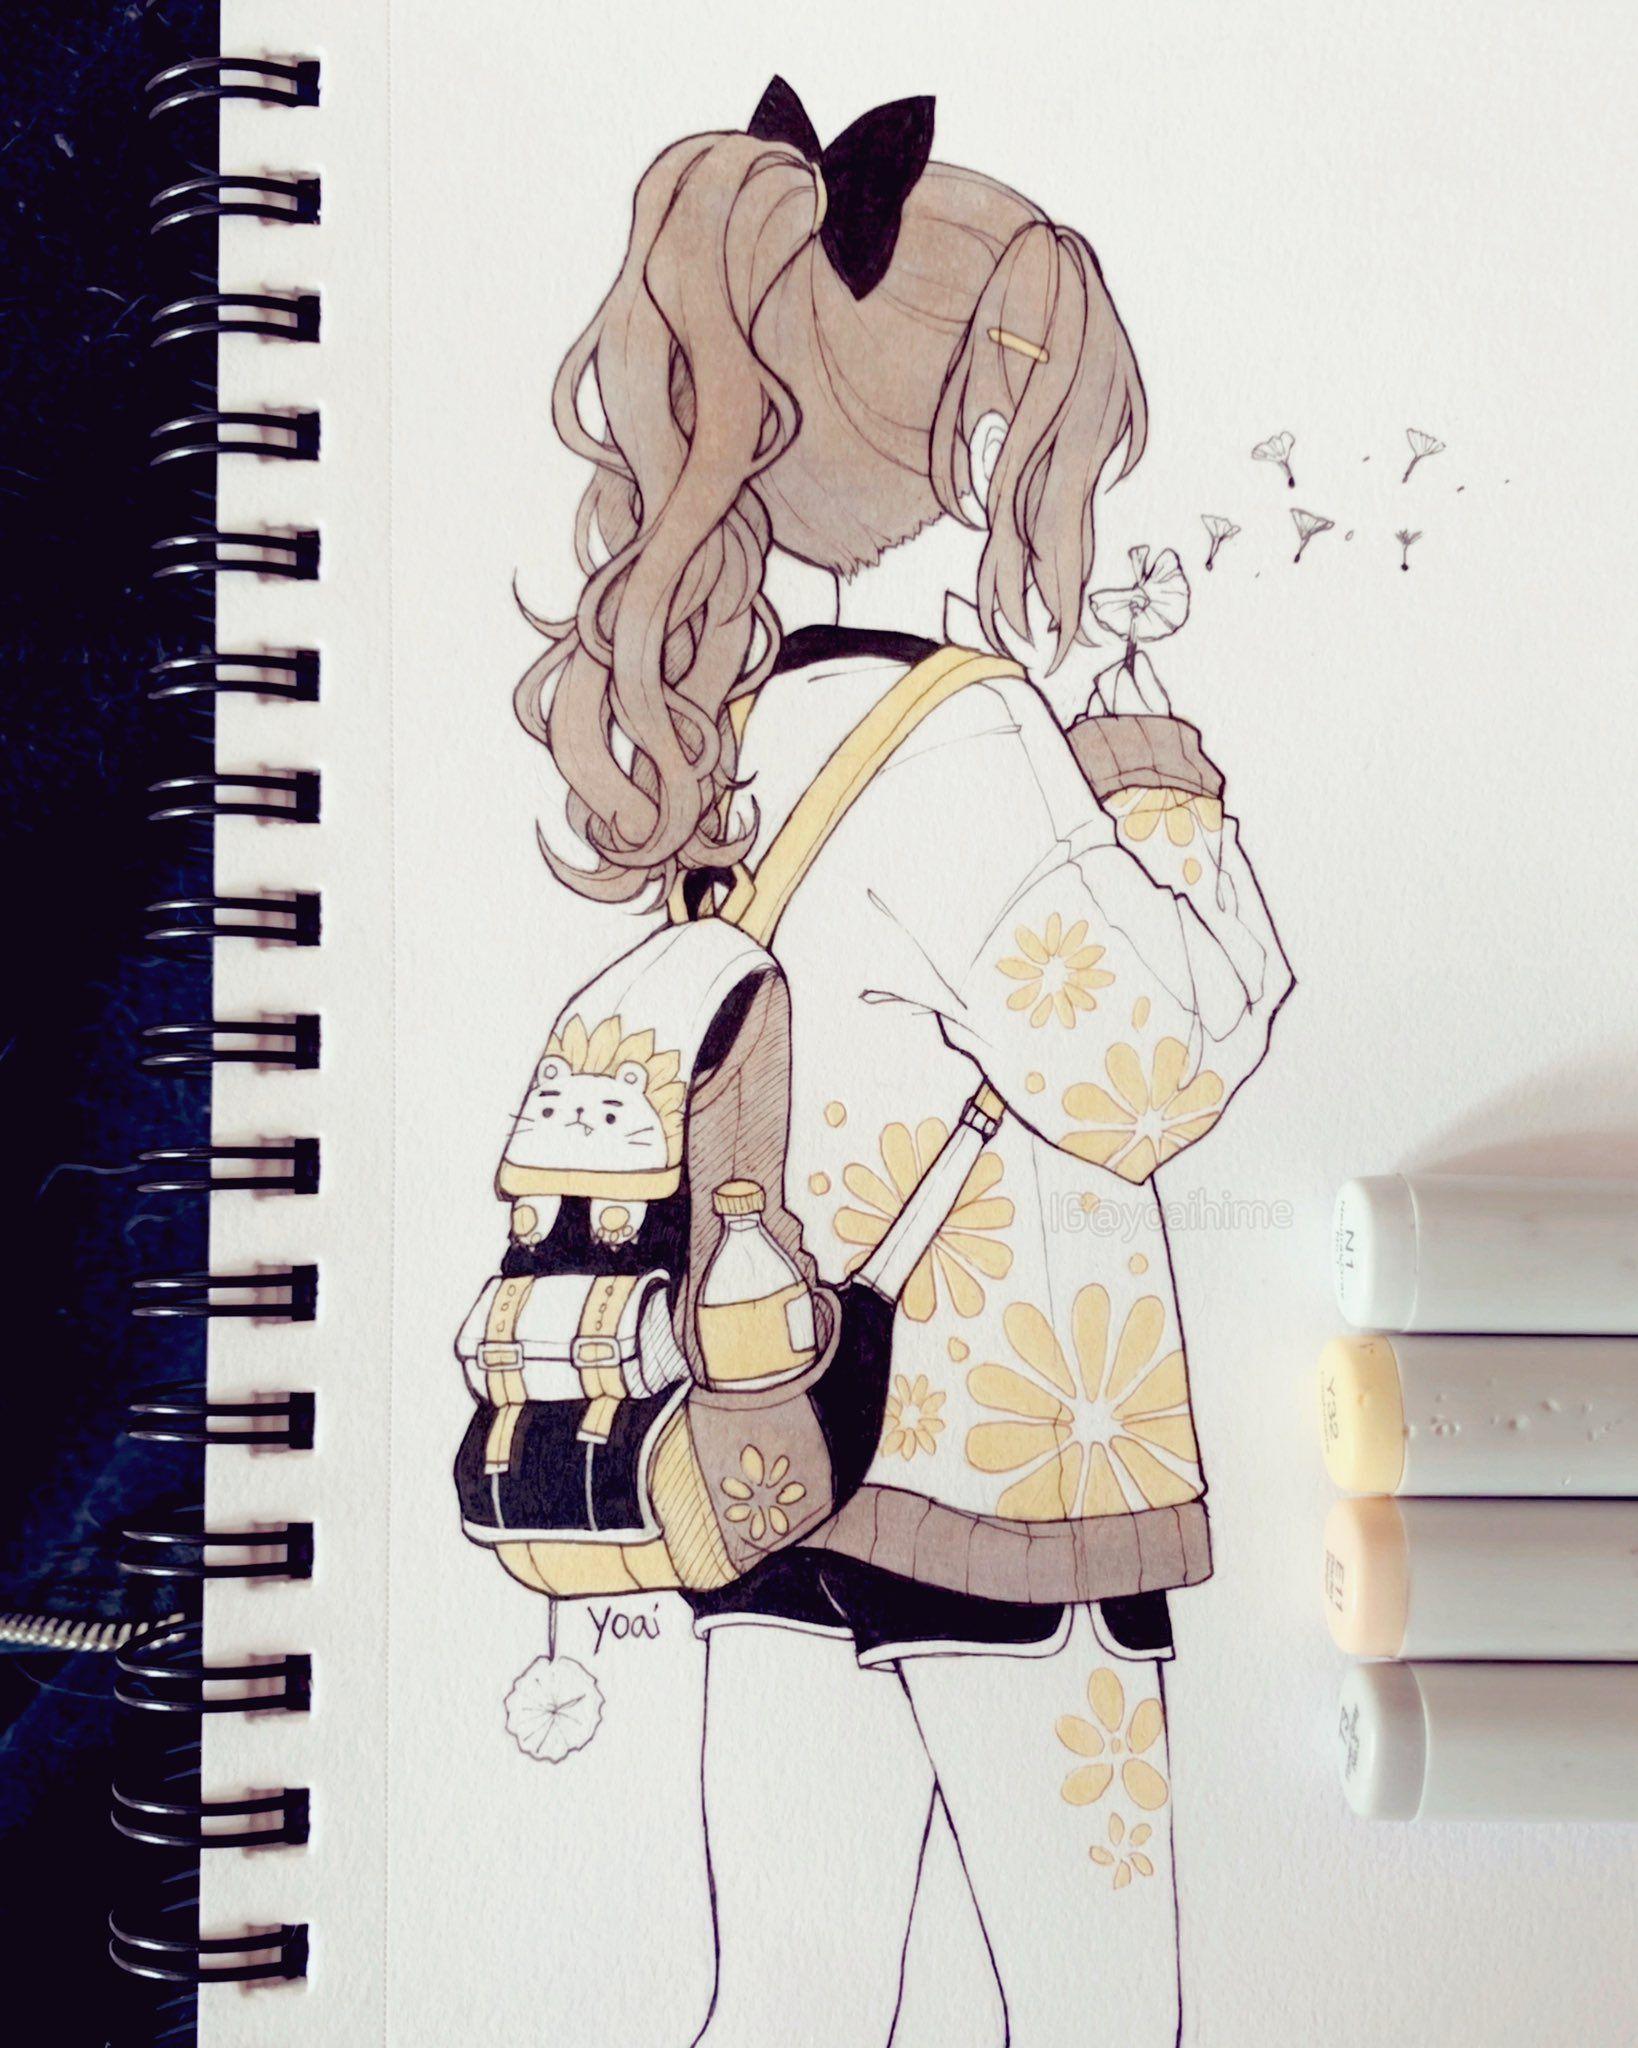 Photo of Dandelion 🌼 By Yoai ✨ಠωಠ✨ @Yoaihime on Twitter